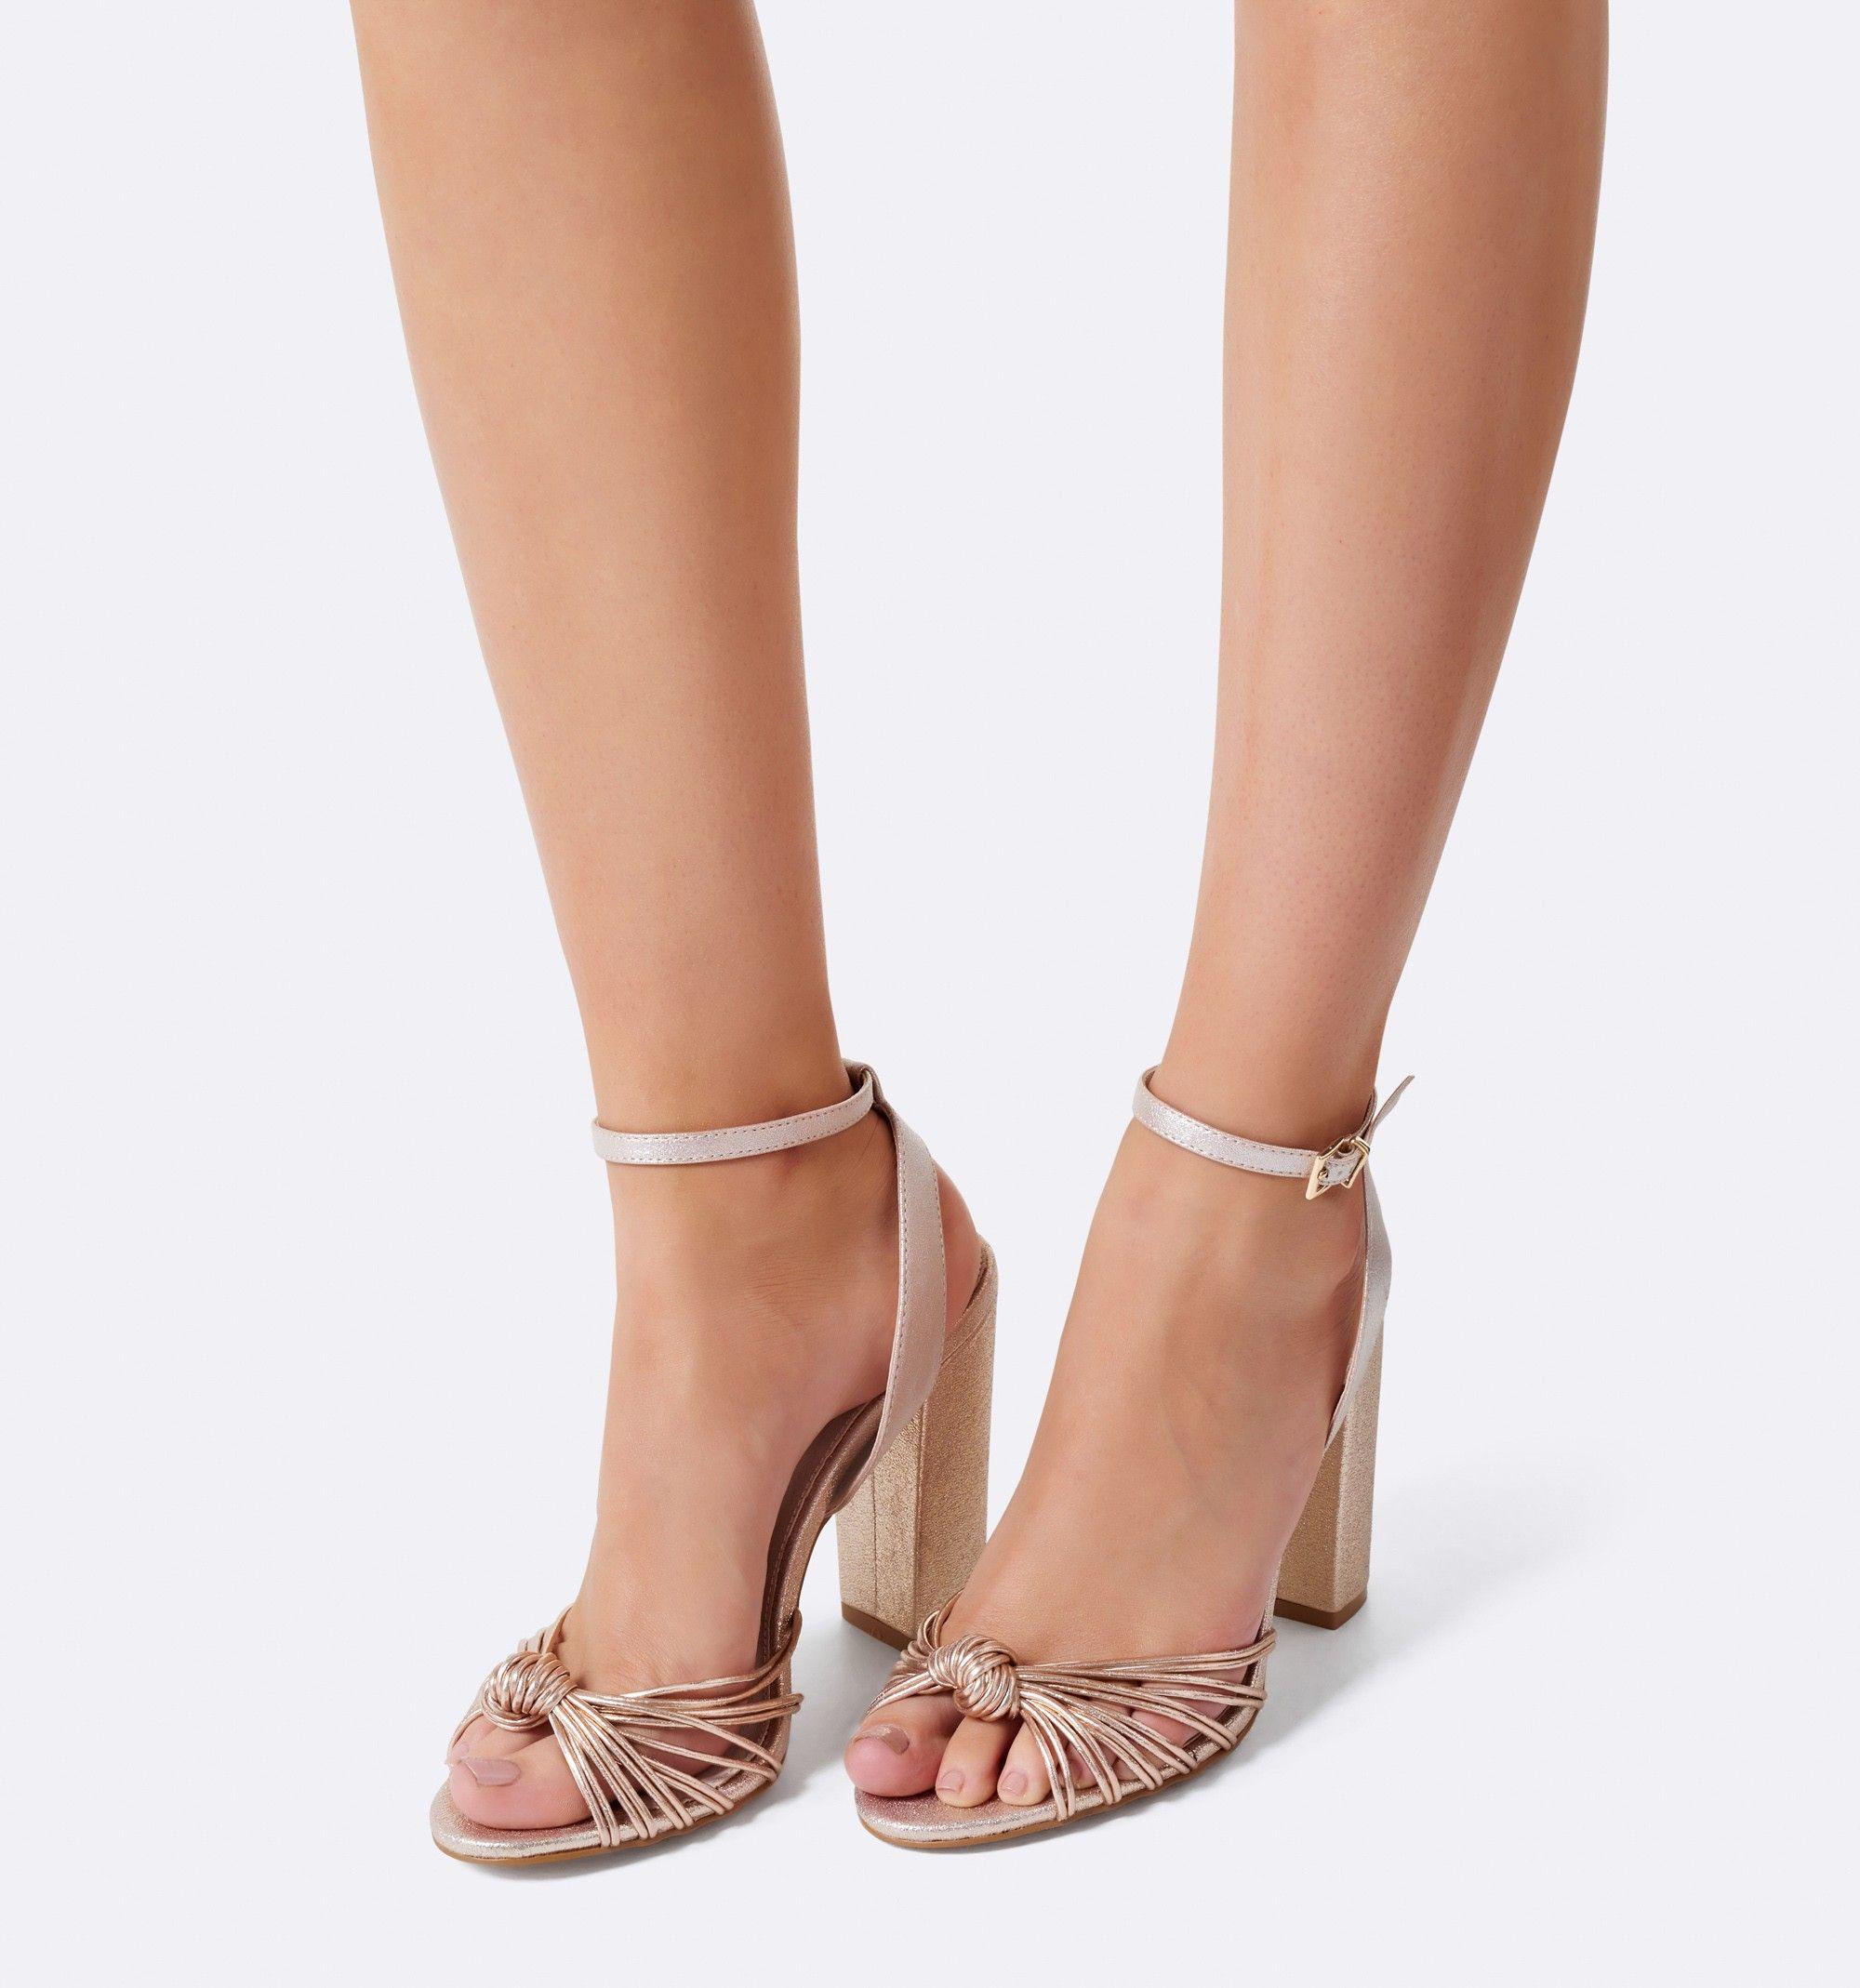 7d87d98ca06 Minnie Knot Vamp Heels Rose Gold - Womens Fashion